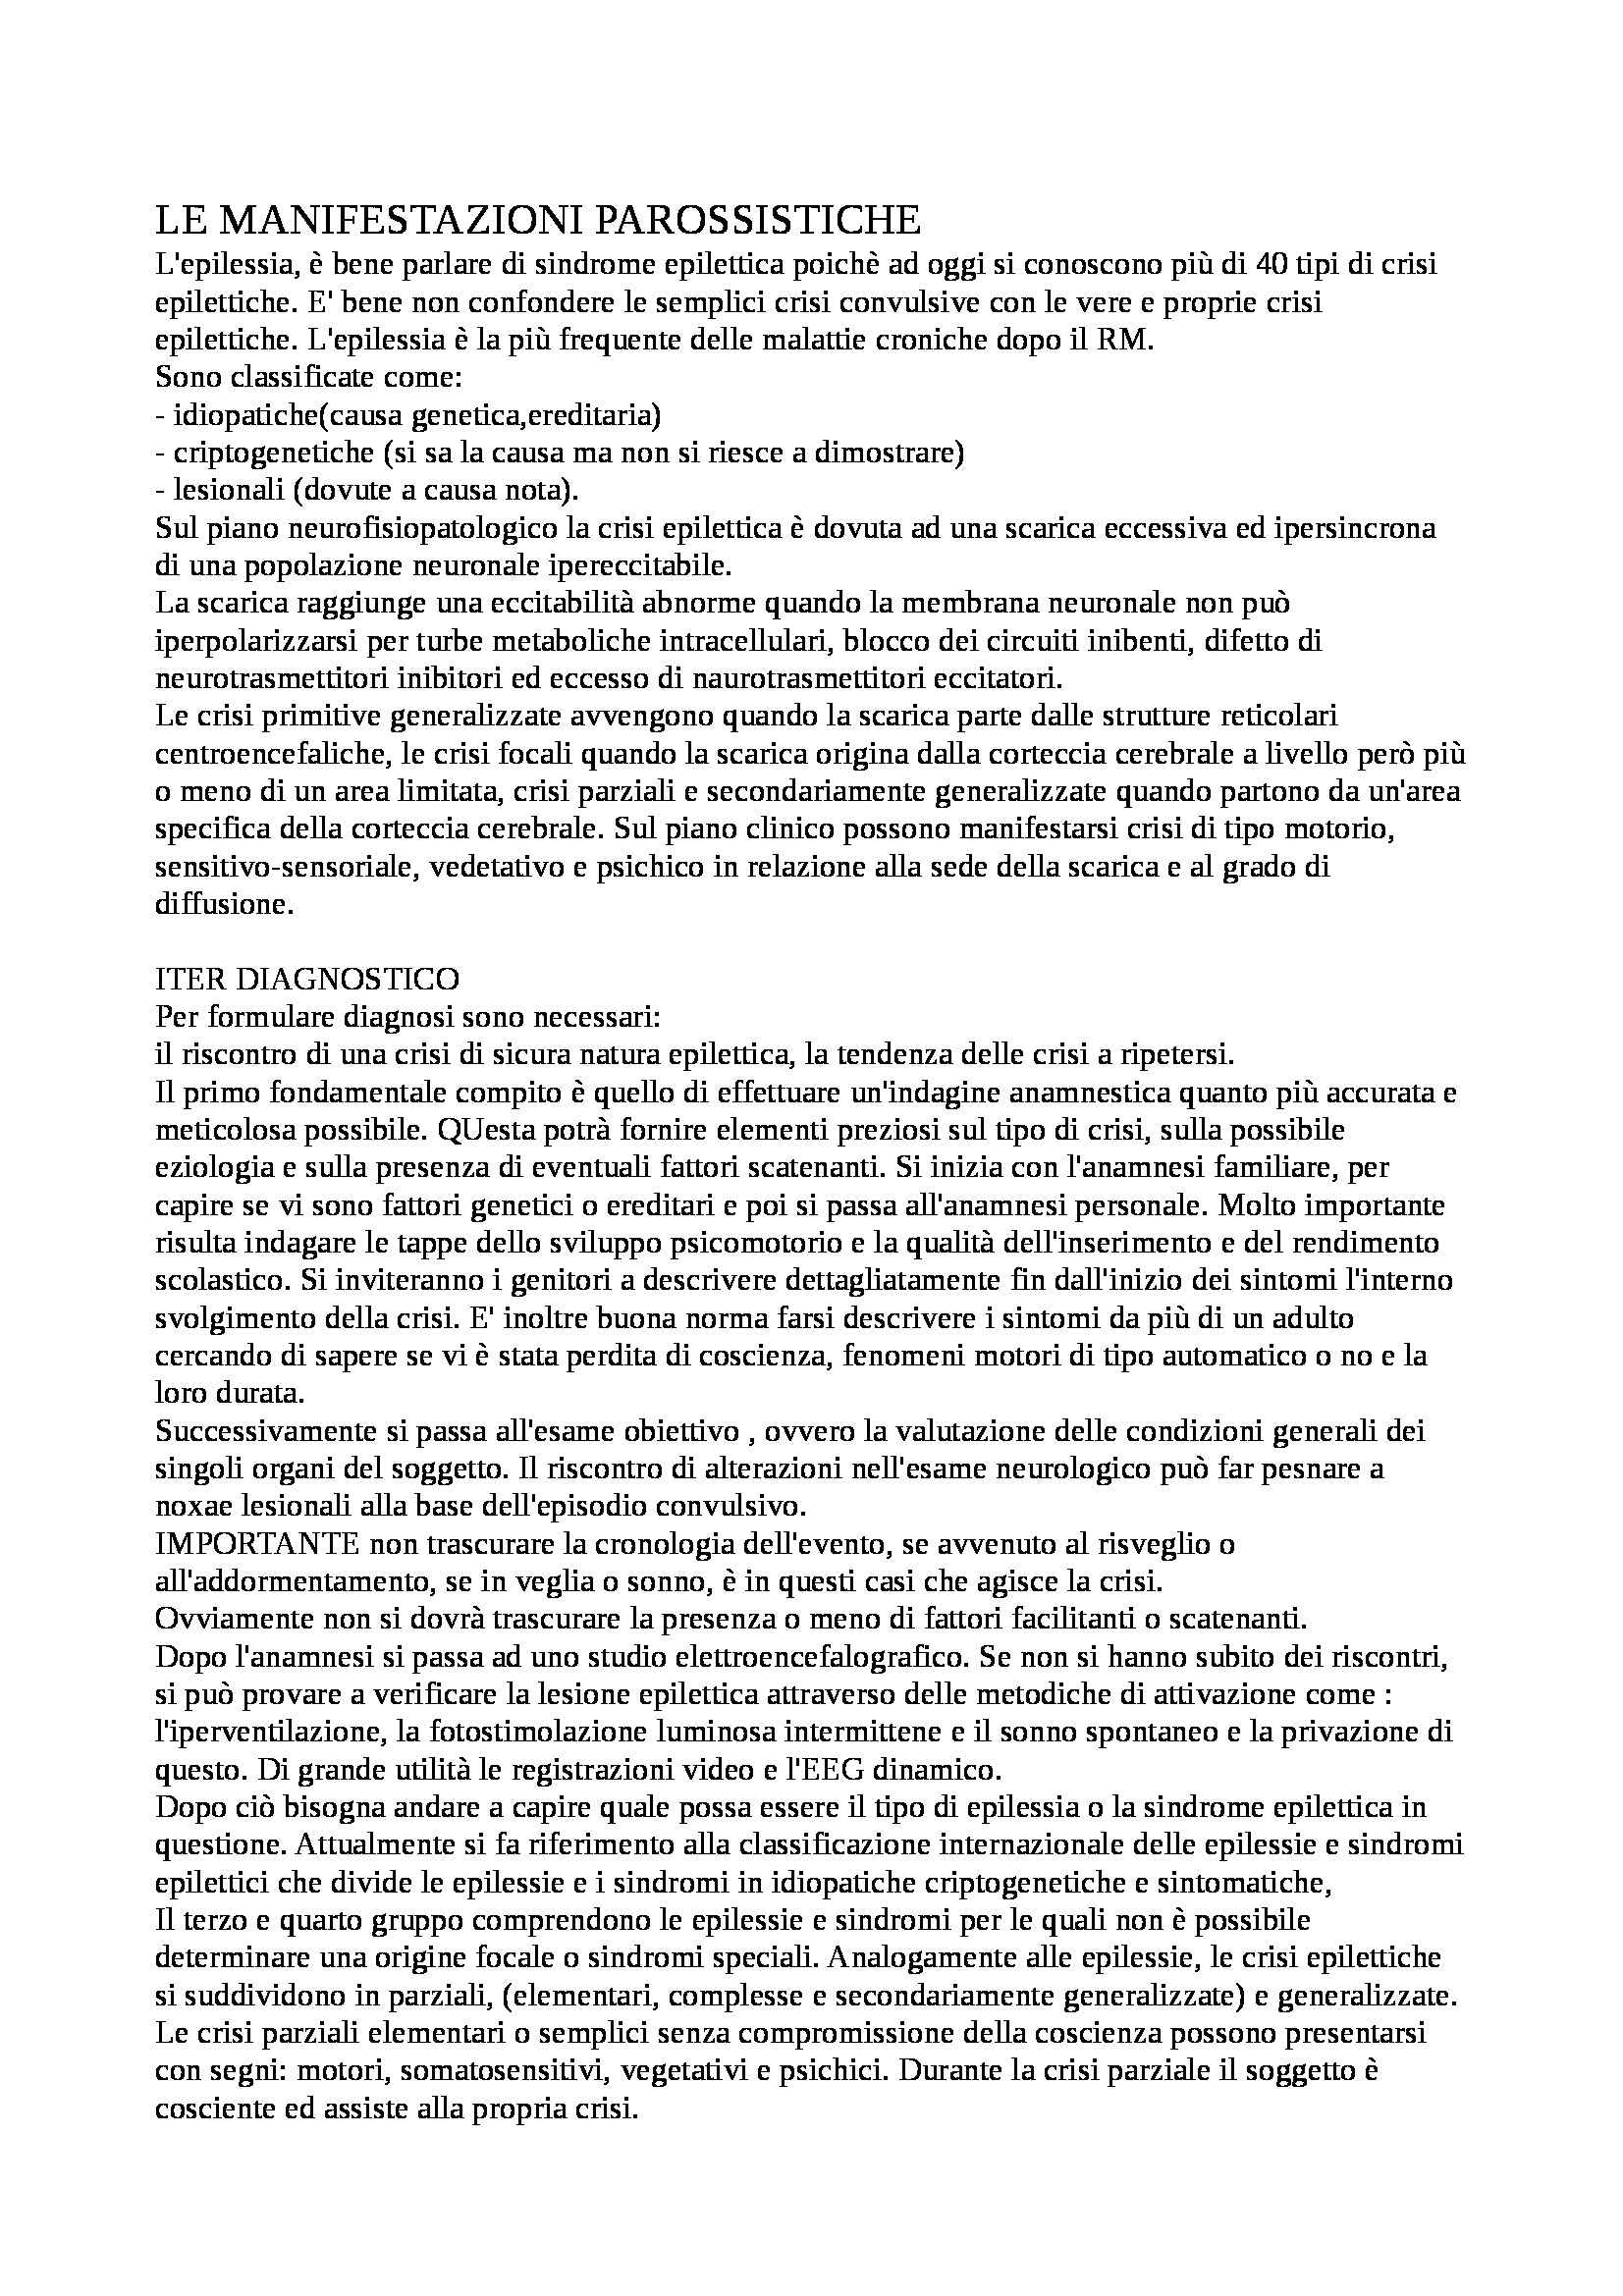 Neuropsichiatria infanitle - manifestazione parossistiche